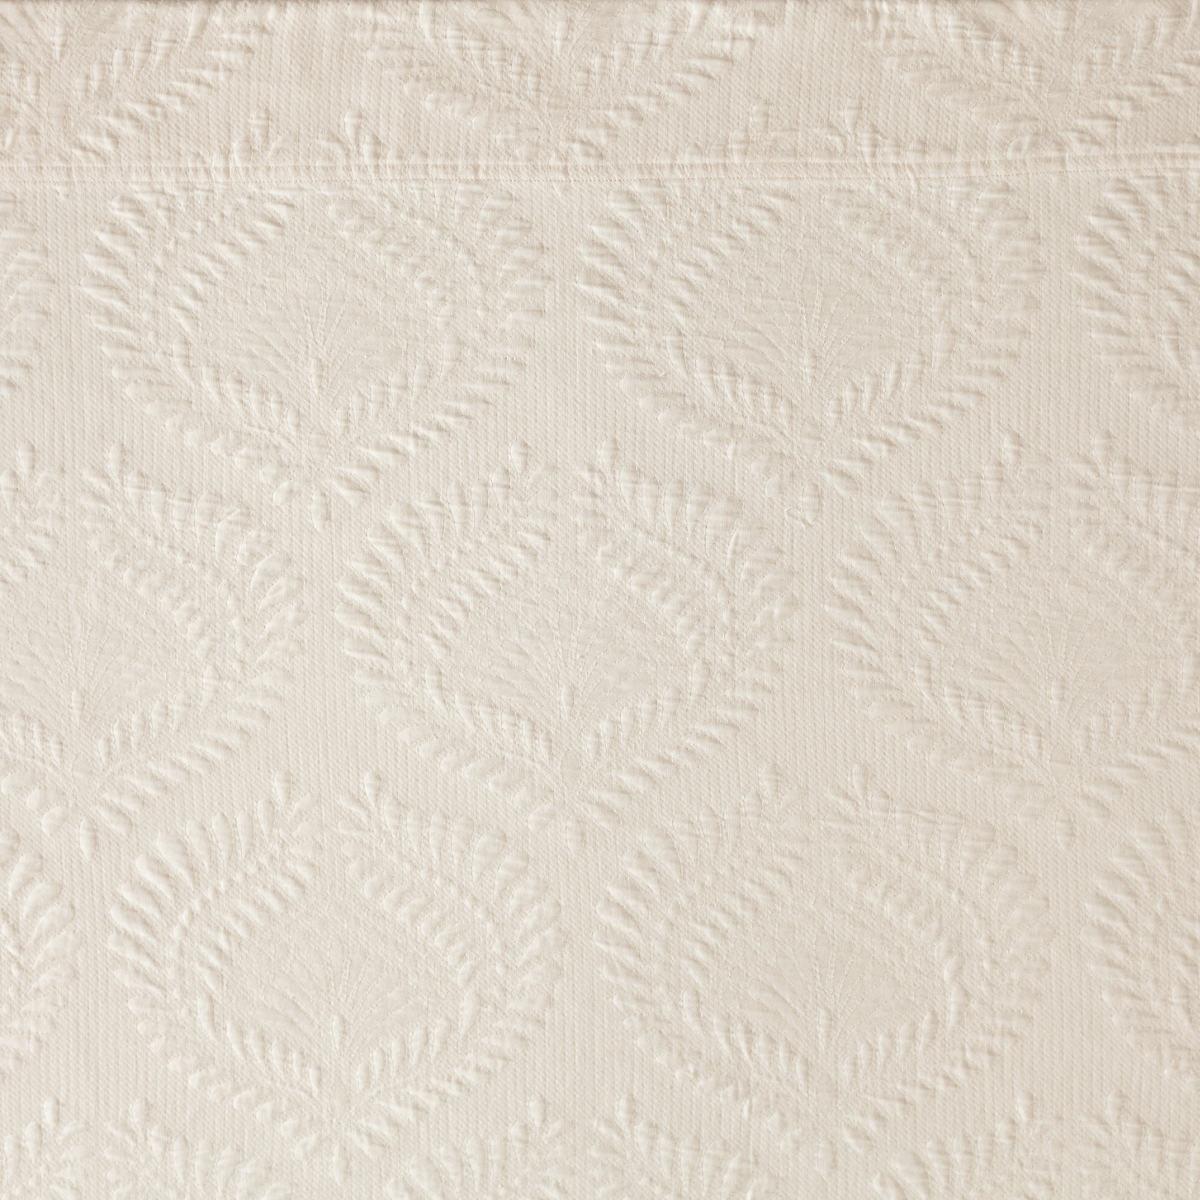 Trinita Ivory Matelassé Coverlet